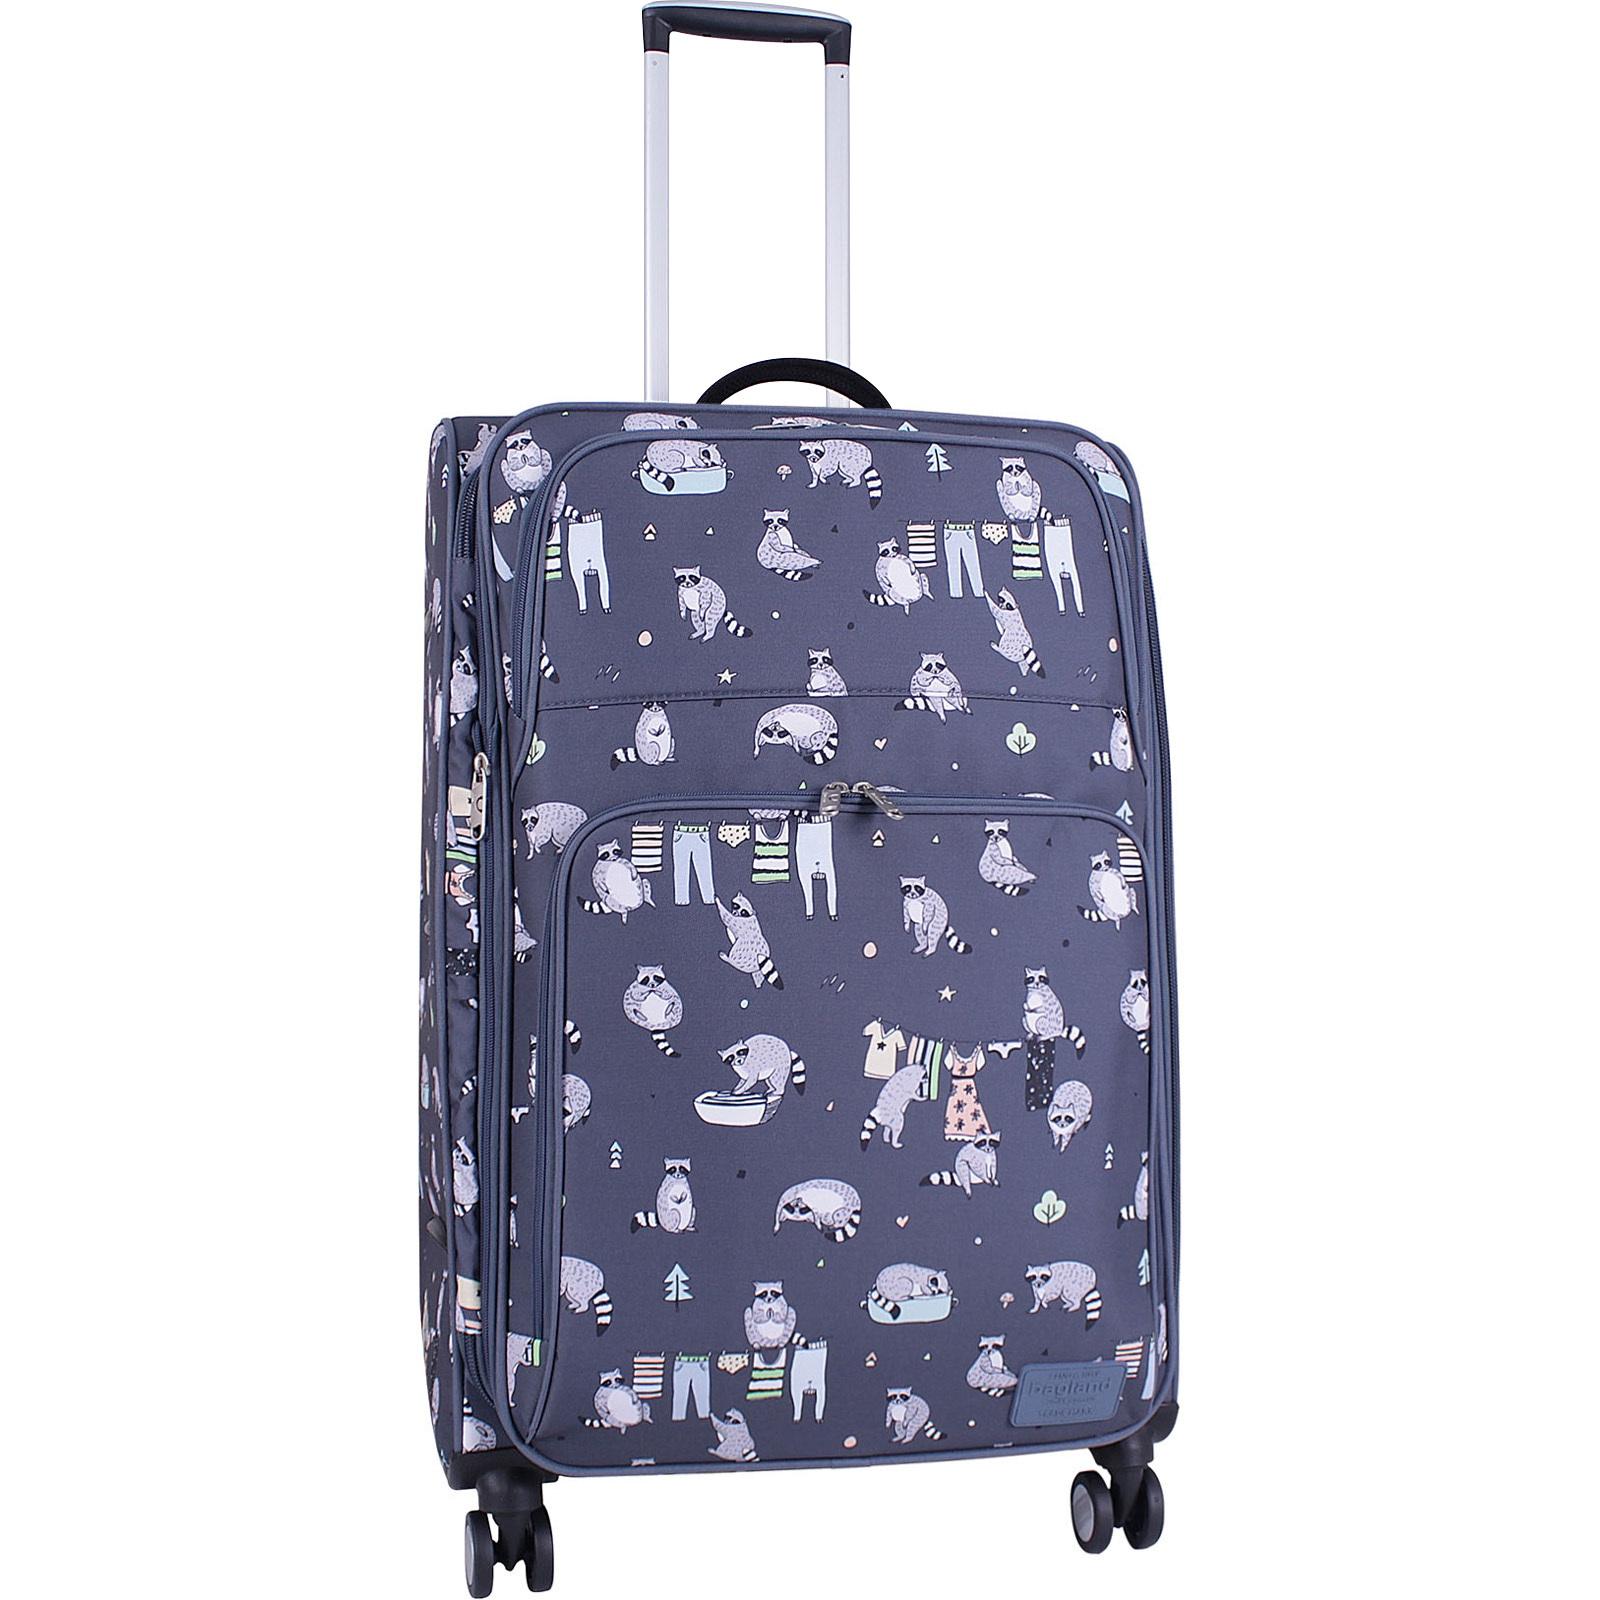 Дорожные чемоданы Чемодан Bagland Валенсия большой дизайн 83л. сублімація 220 (0037966274) IMG_4873_суб.220_.JPG